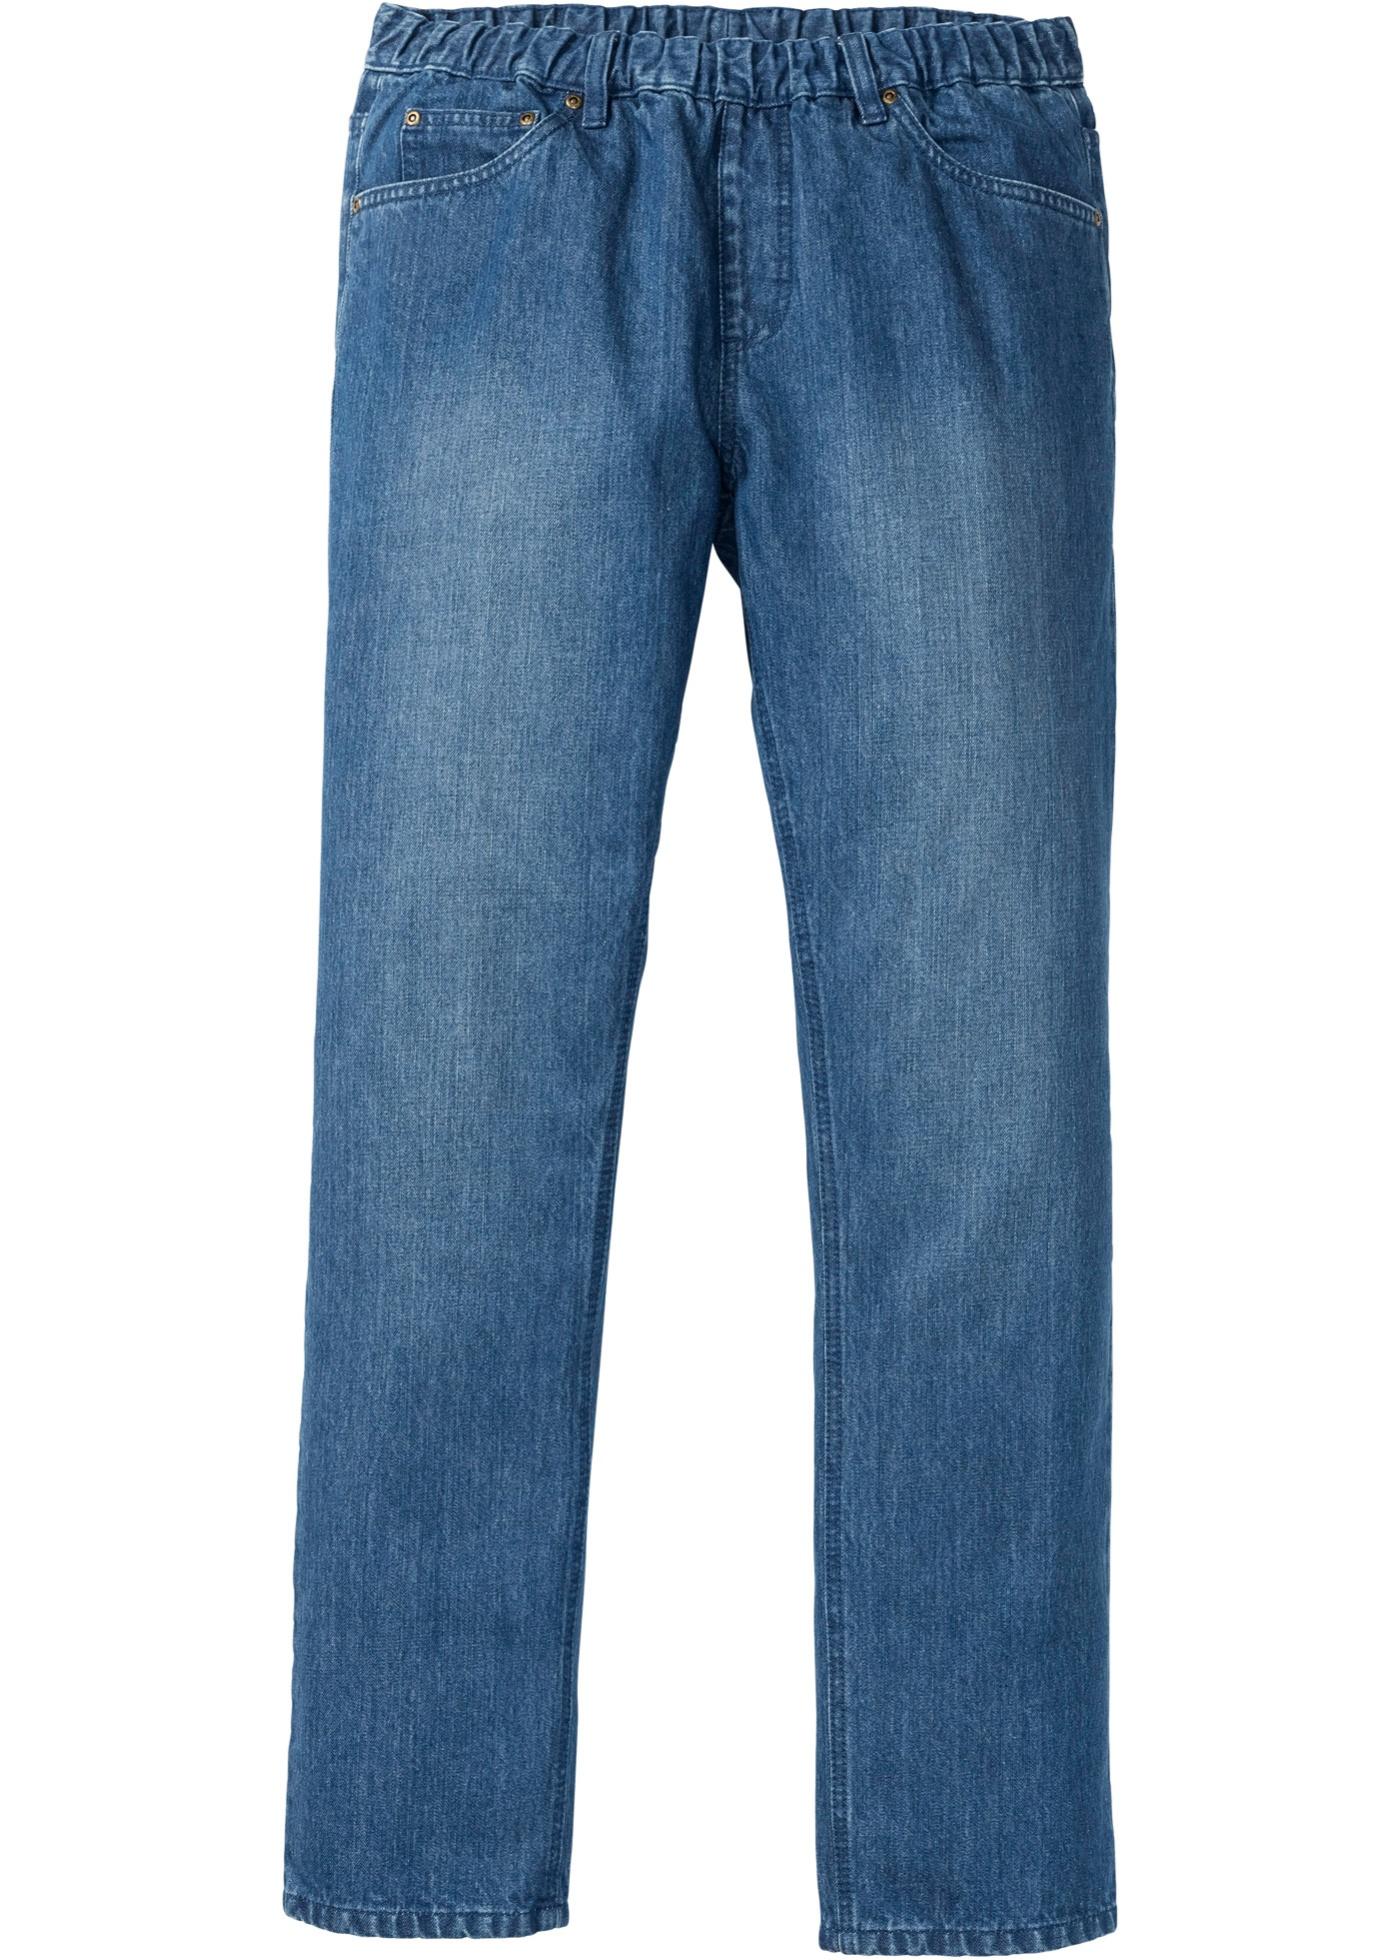 Bonprix - Dra p??-jeans, normal passform, raka ben 199.00